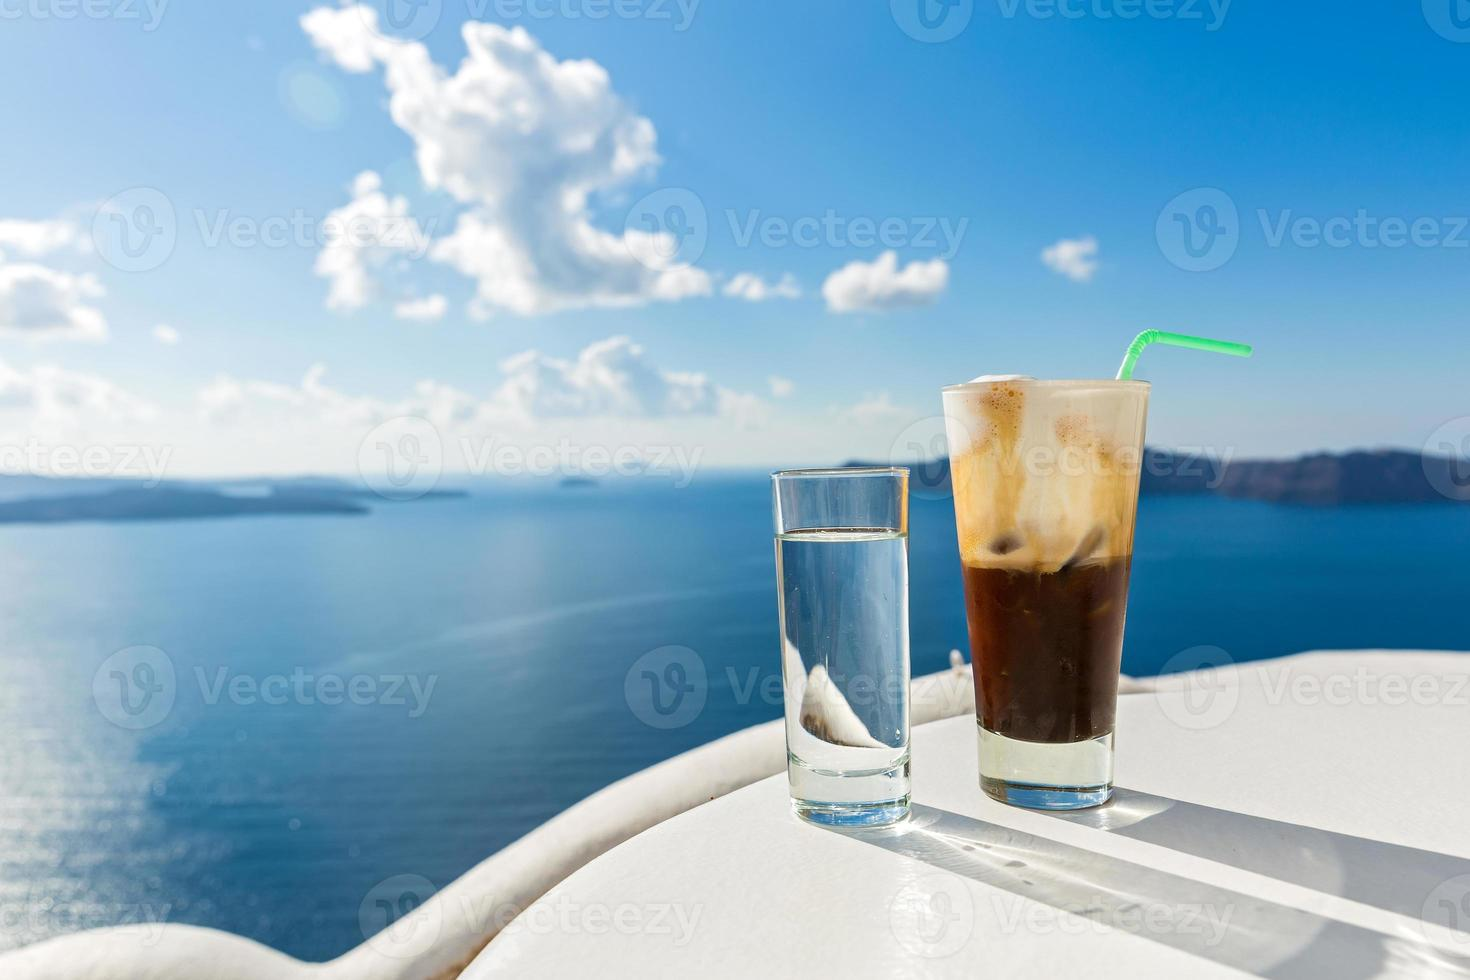 bevanda rinfrescante vicino al mare foto